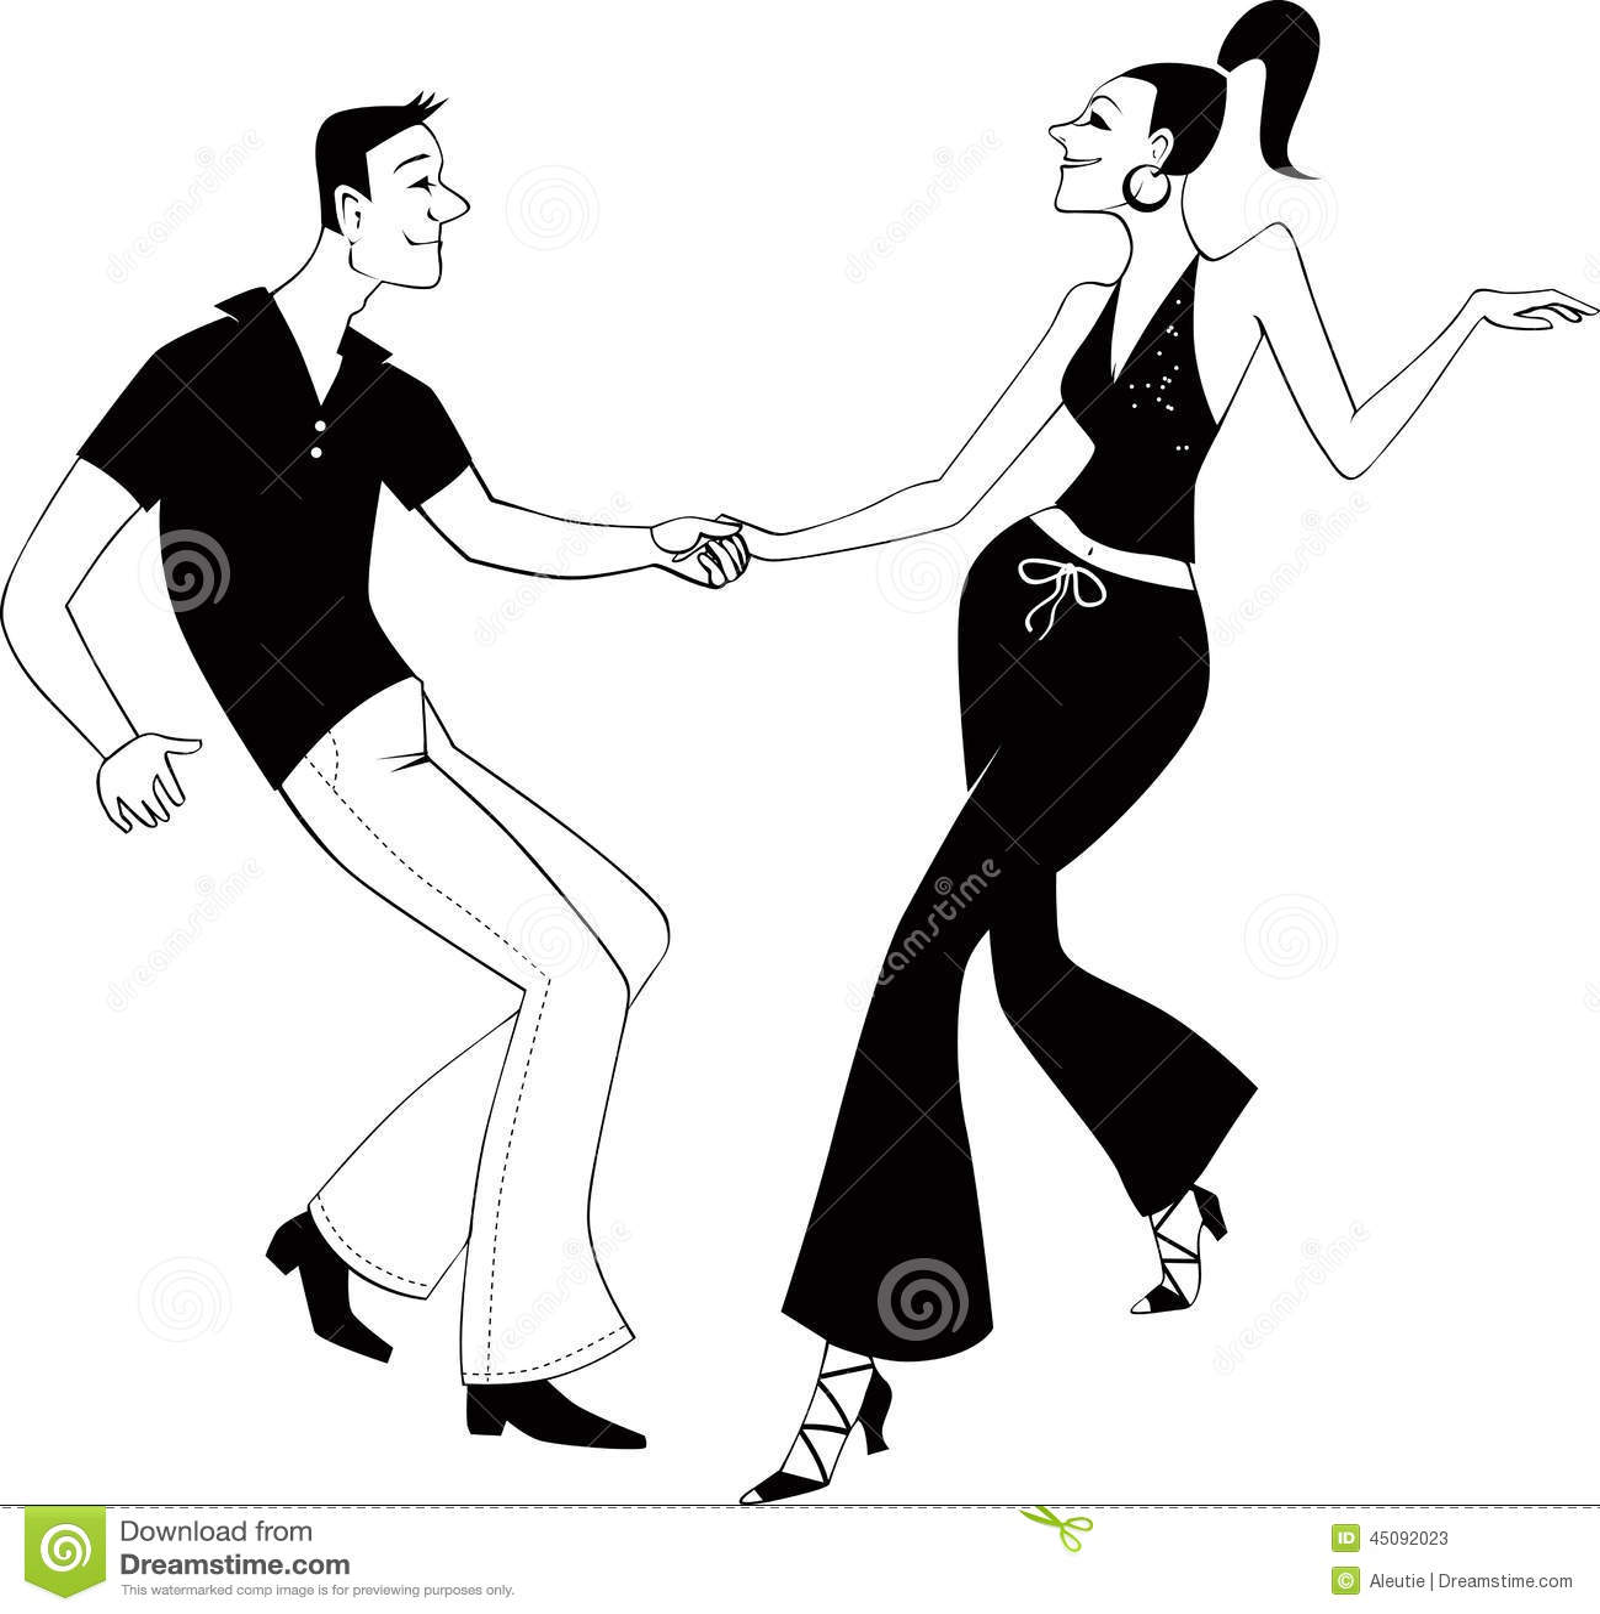 2 way kiss line dance mitsubishi truck wiring diagram west coast swing dancers clip art stock vector